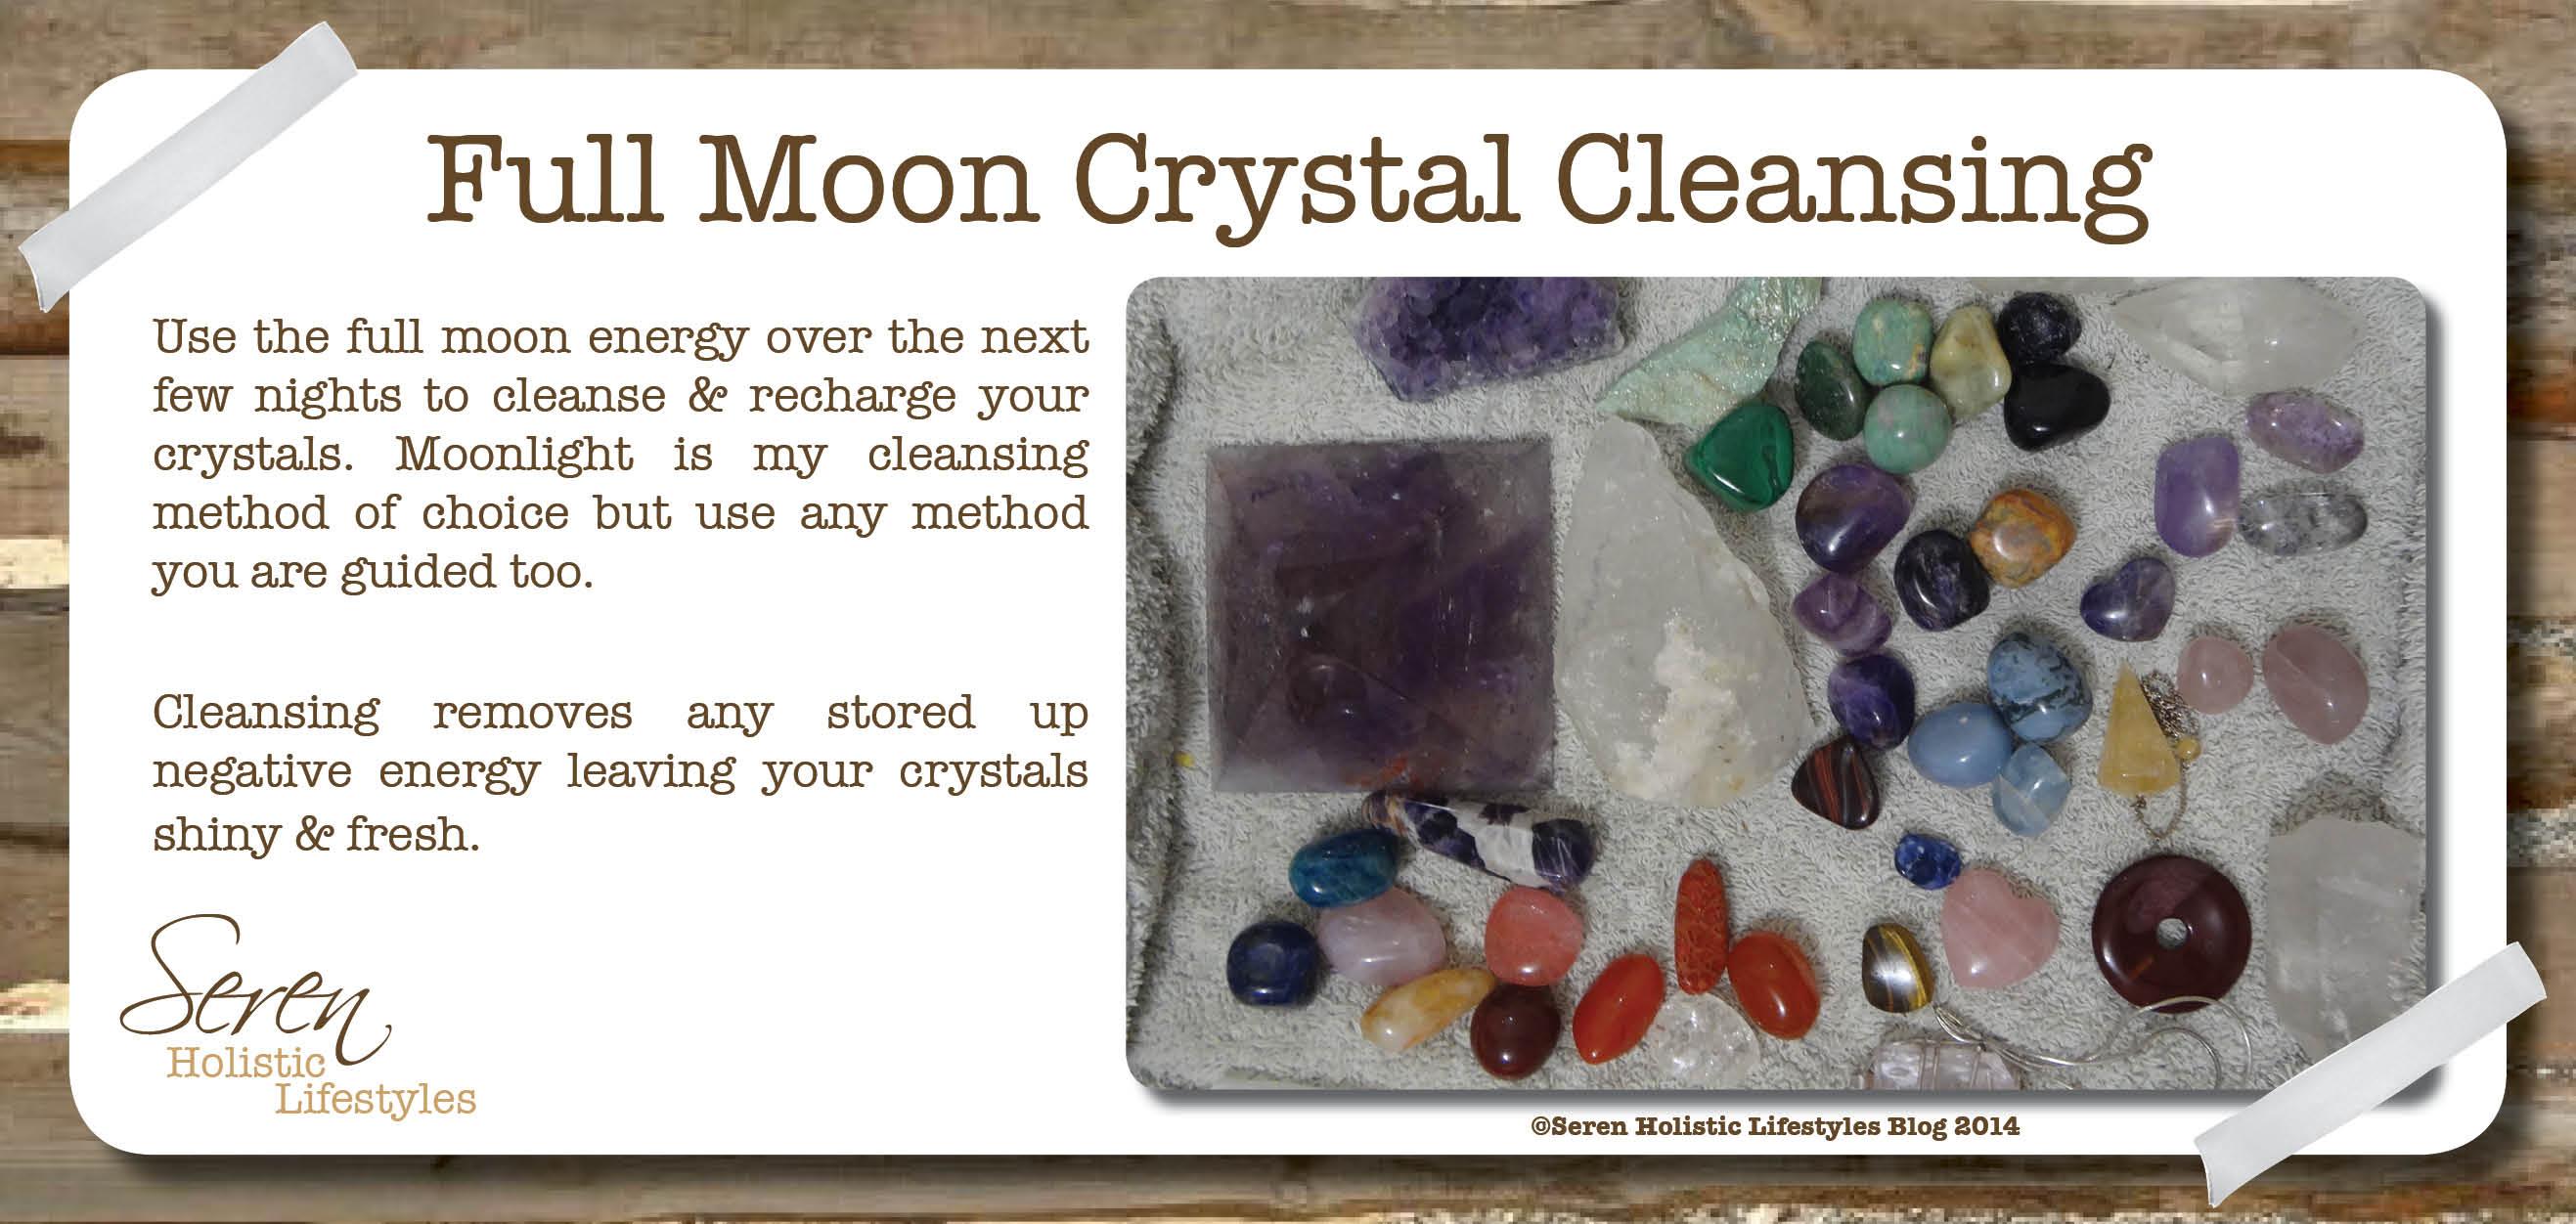 Full Moon Cleansing - Seren Holistic Lifestyles